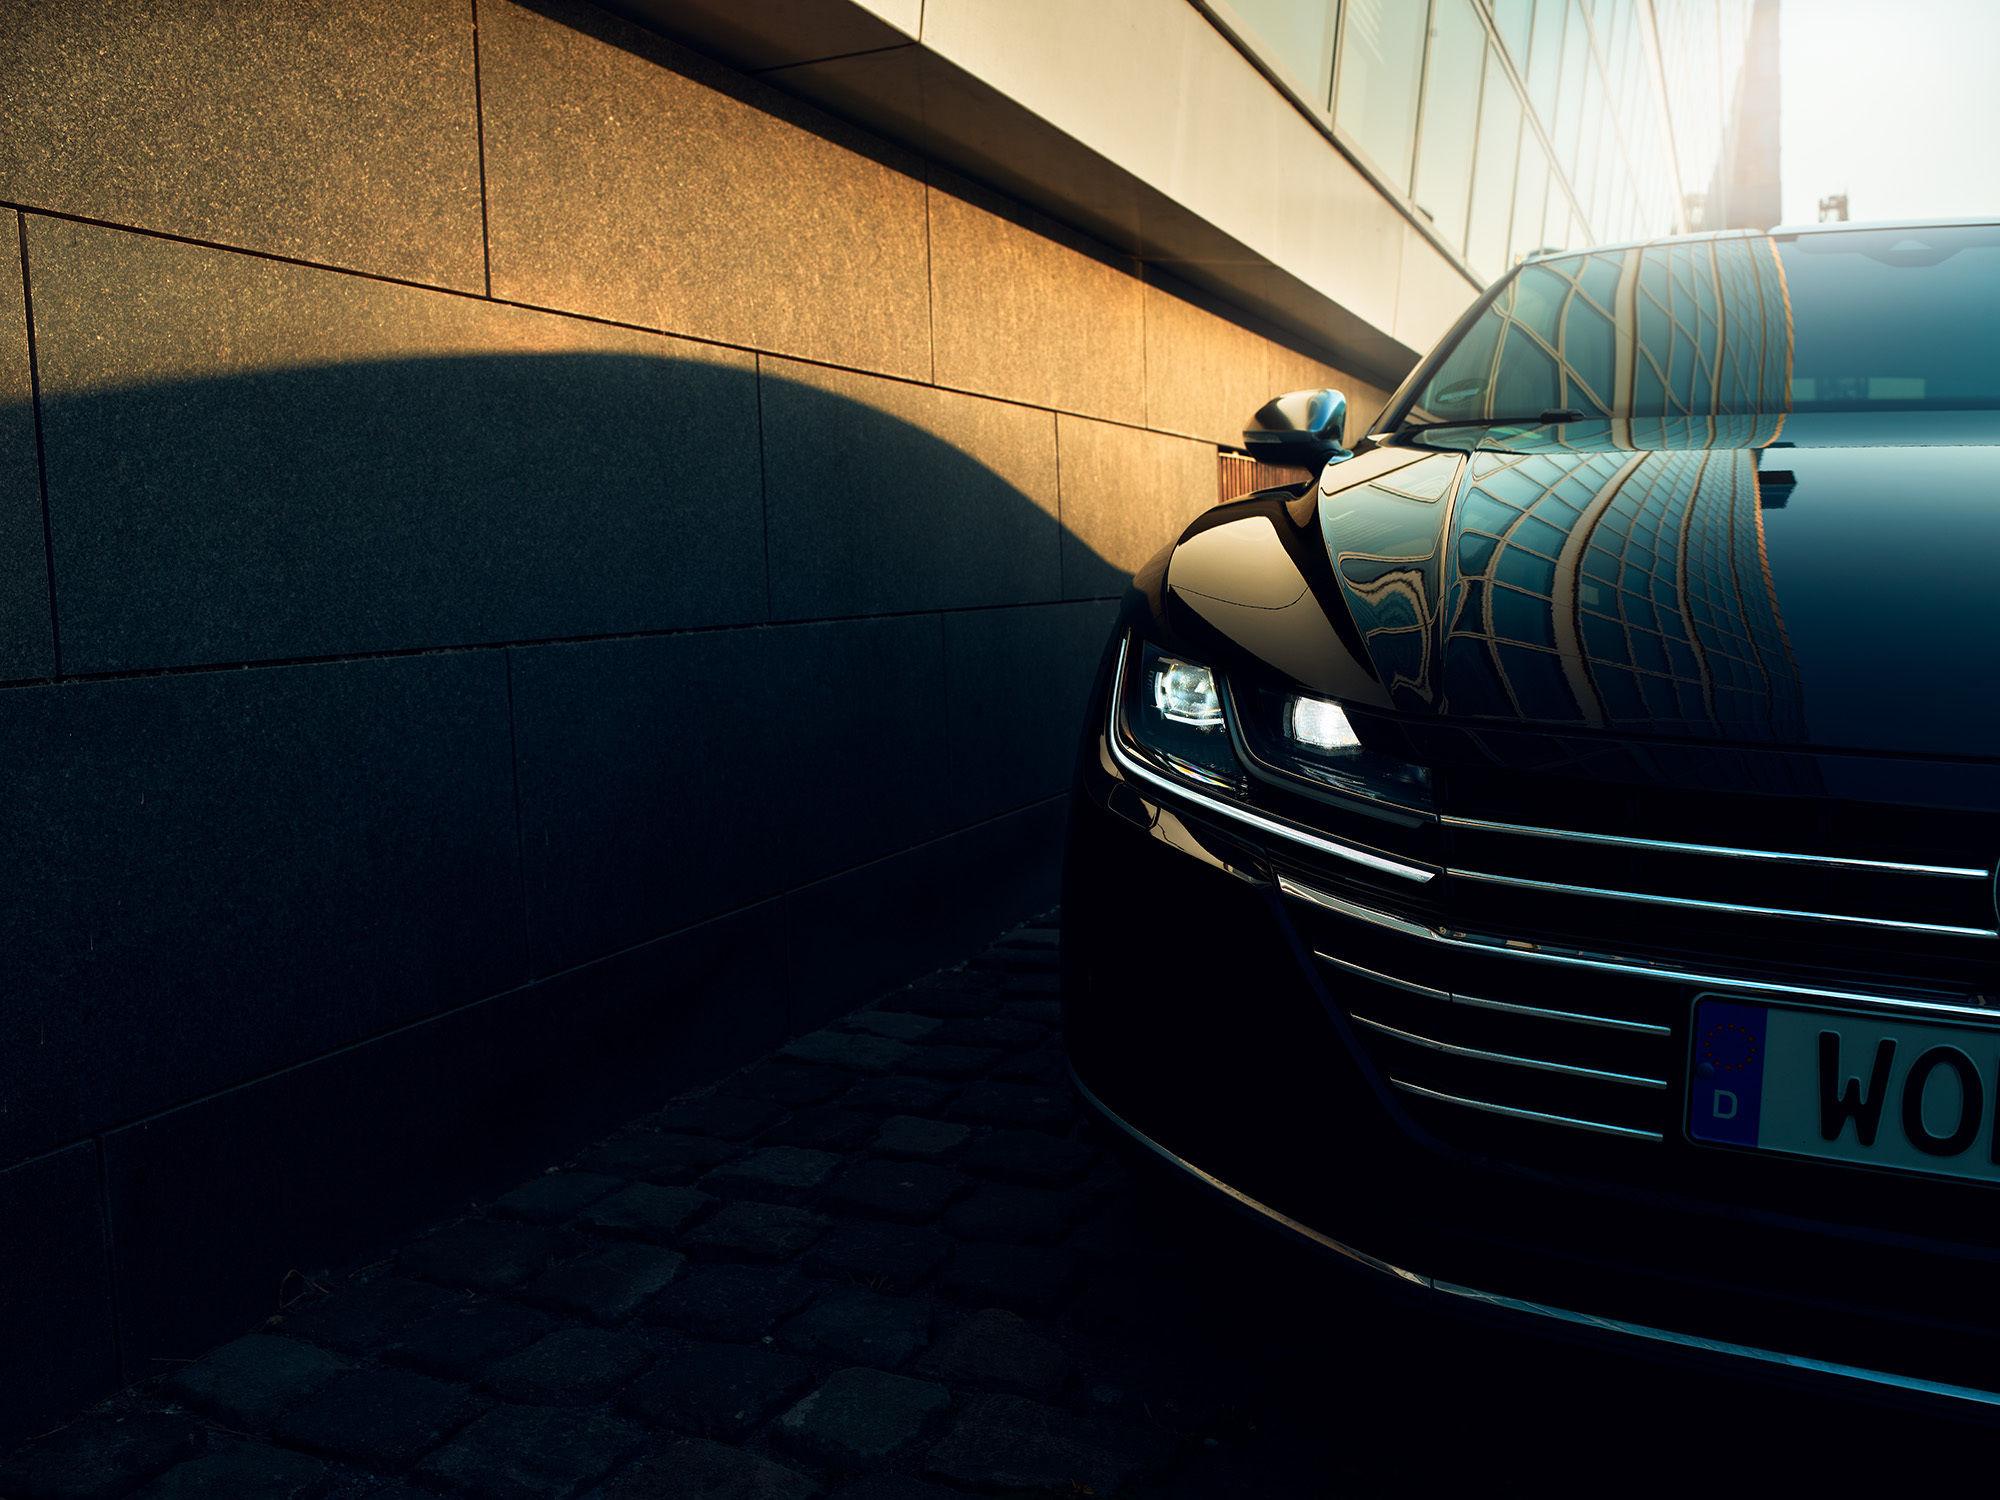 THOMAS SCHORN - VW ARTEON / REPRESENTED BY BANRAP / CLIENT - VOLKSWAGEN DEUTSCHLAND / AGENCY - GRABARZ & PARTNER